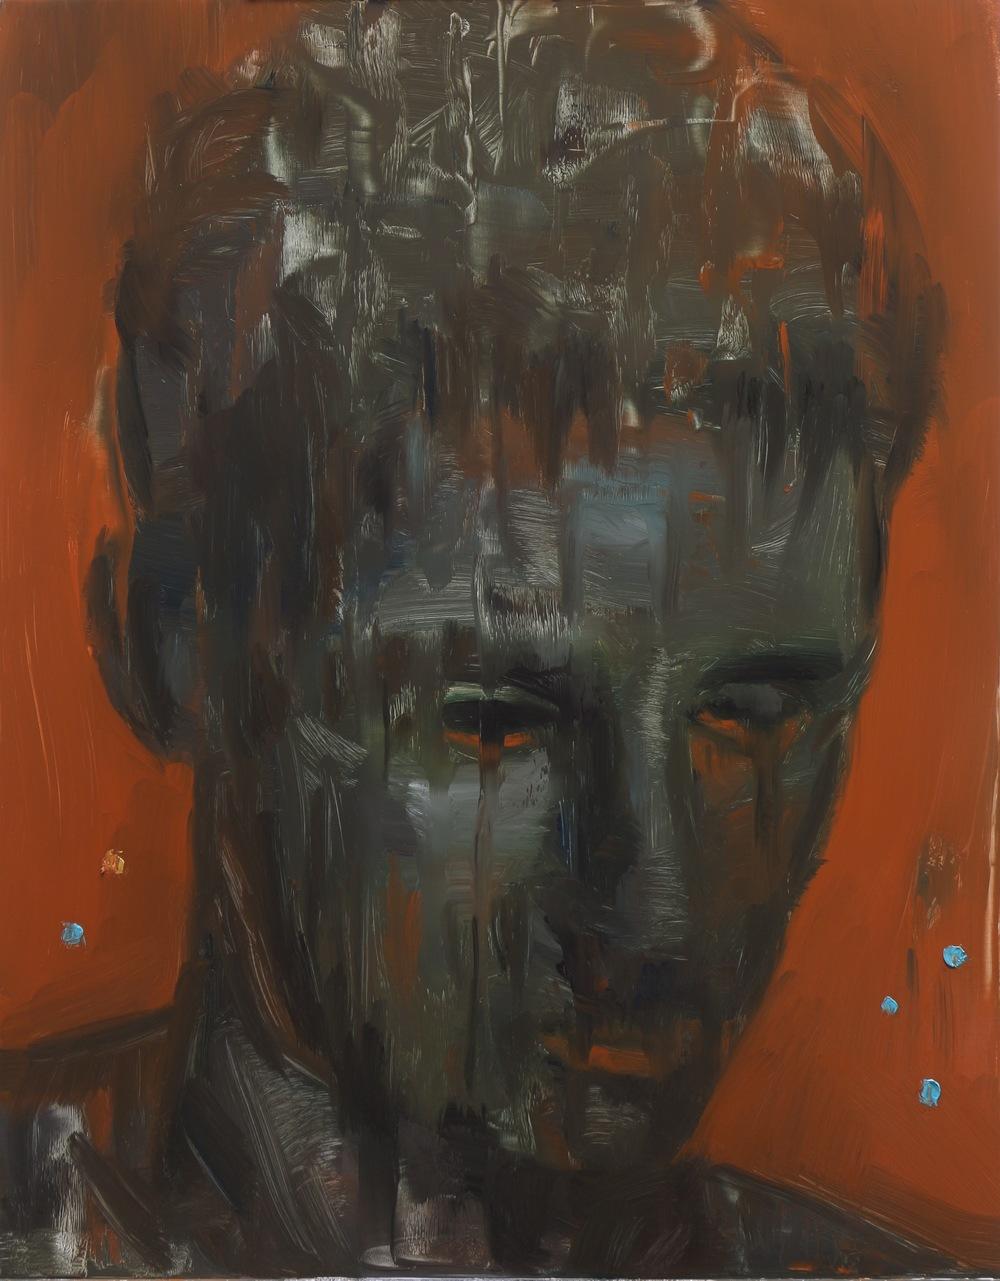 Guardian, Oil on aluminium, 36 x 28cm, 2015